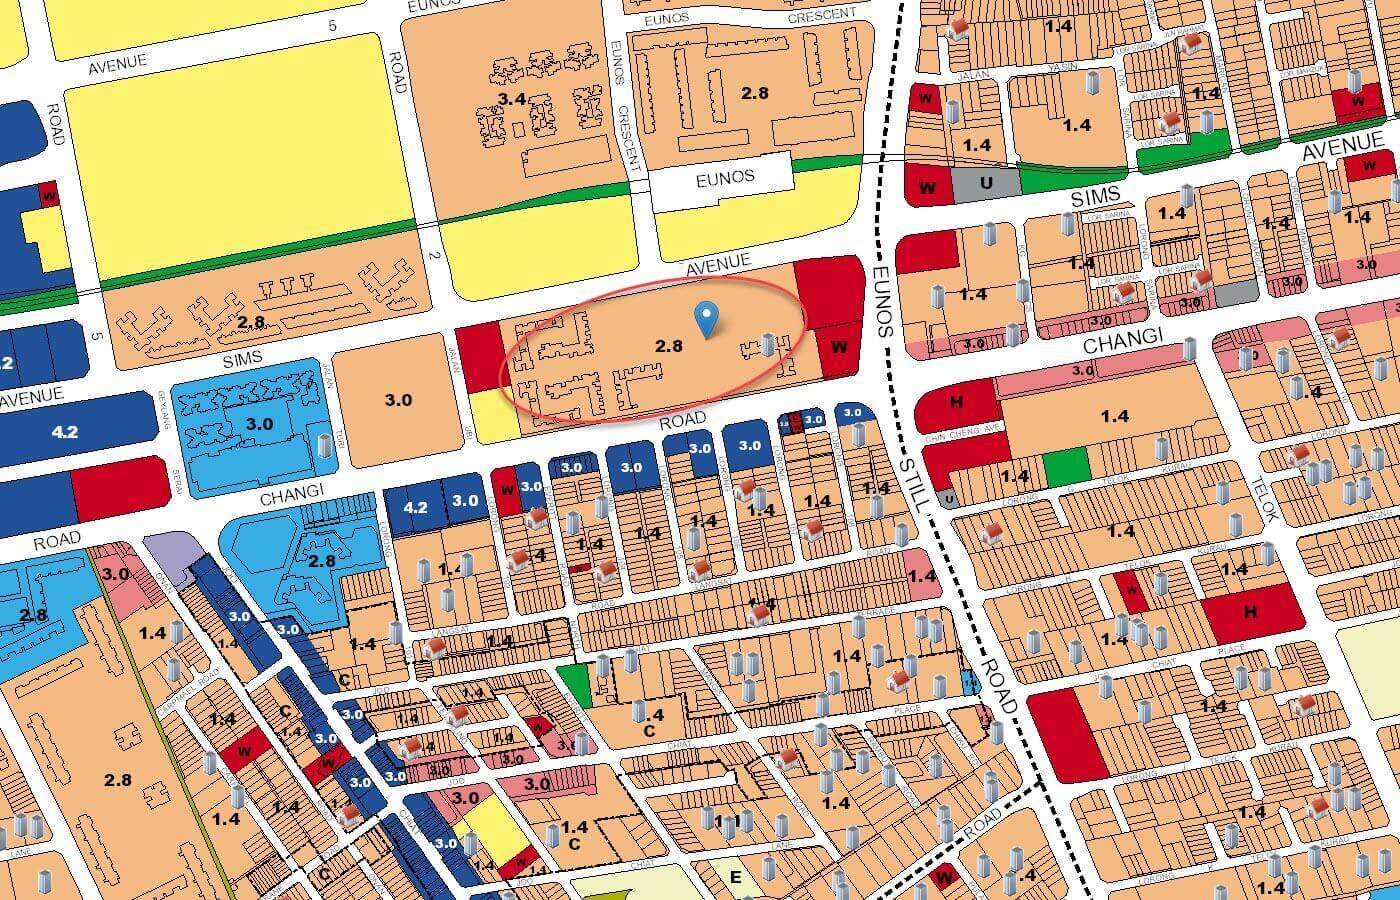 Parc Esta Condo URA Master Plan Map